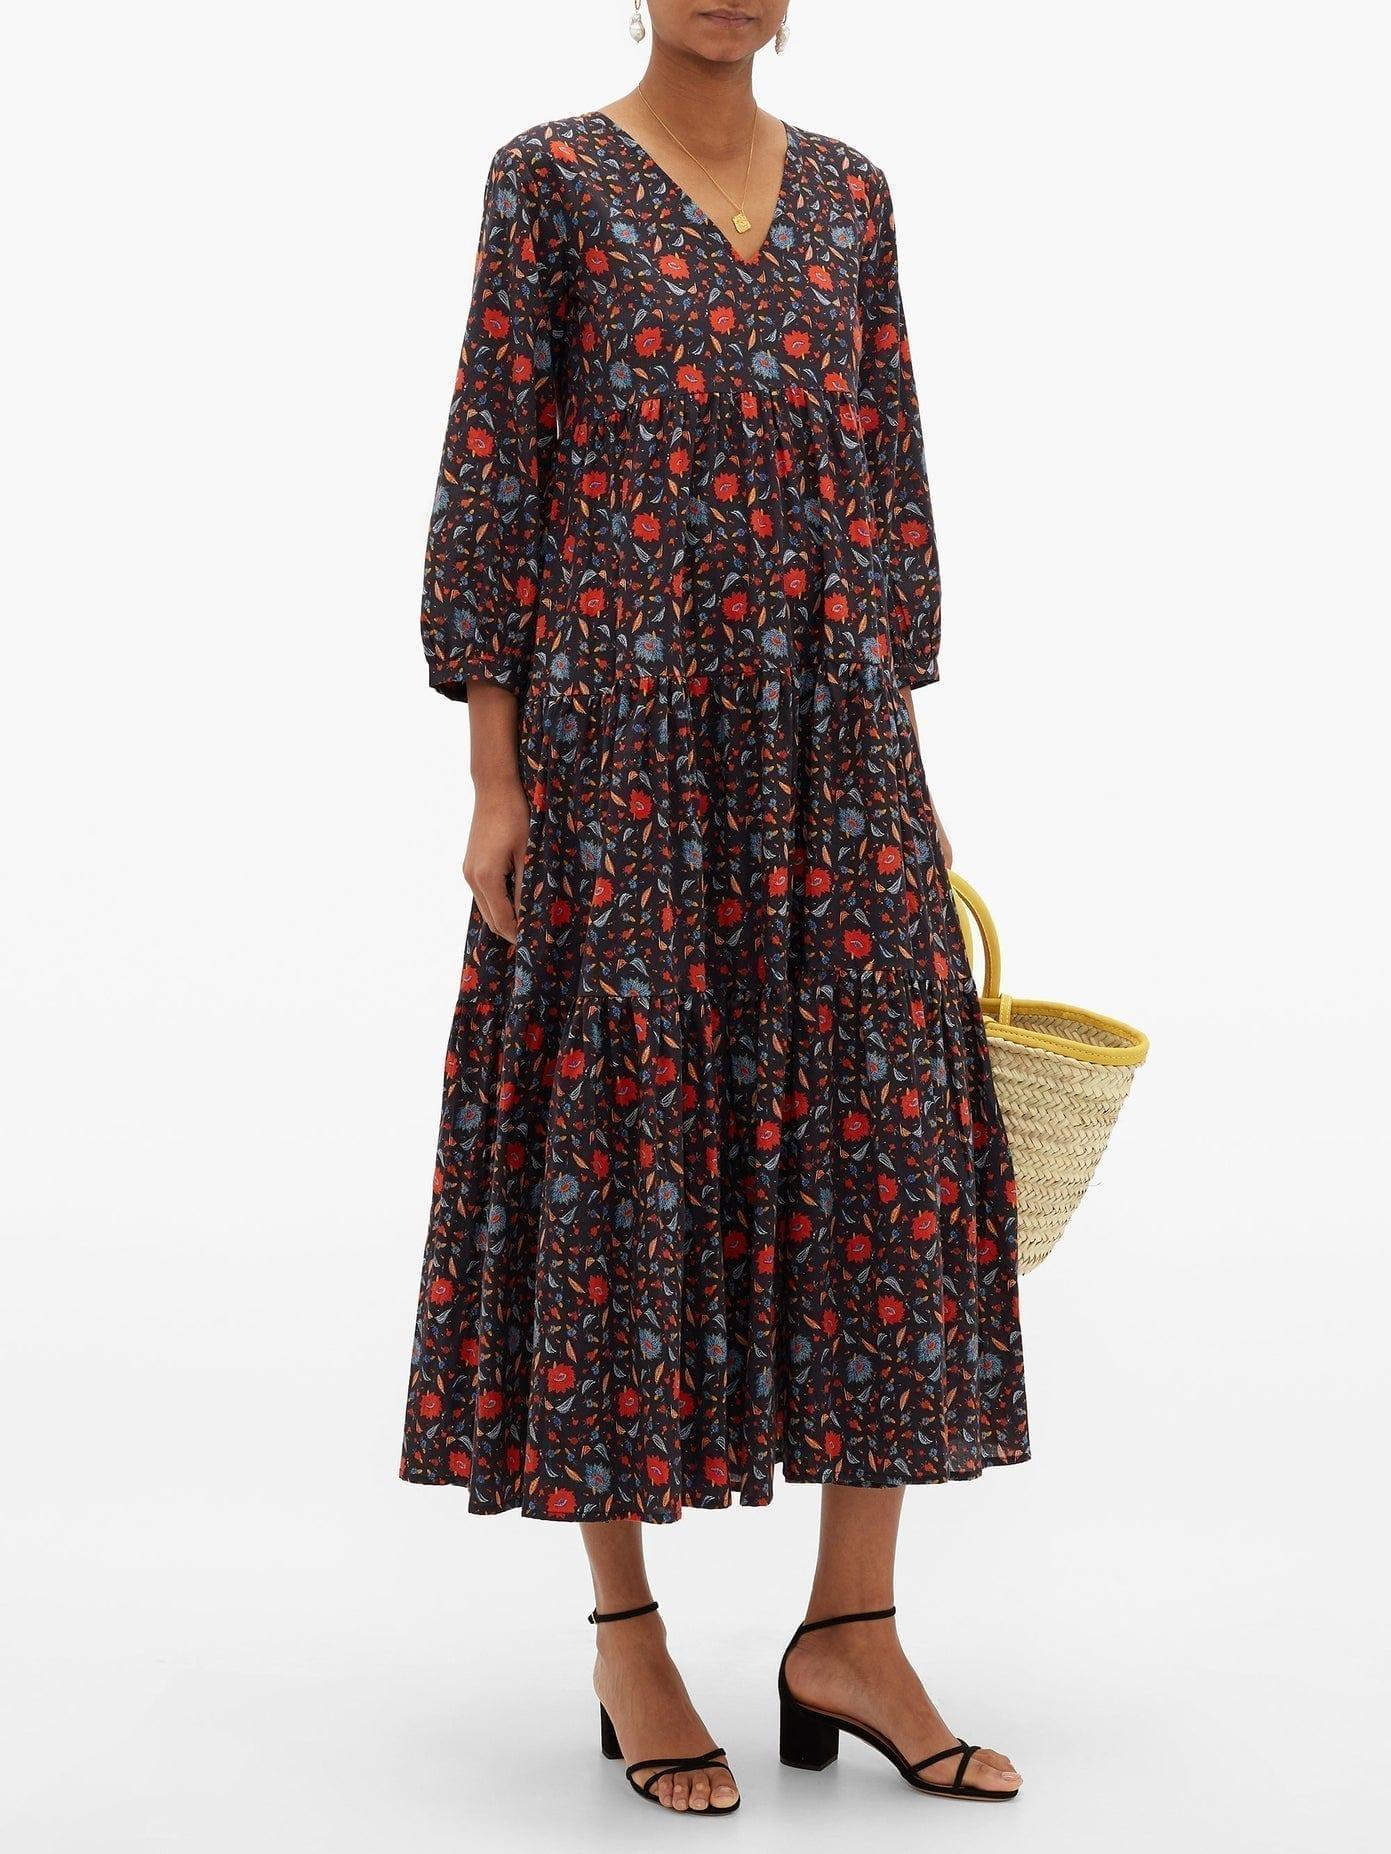 MUZUNGU SISTERS Floral-Print Organic-Cotton Dress